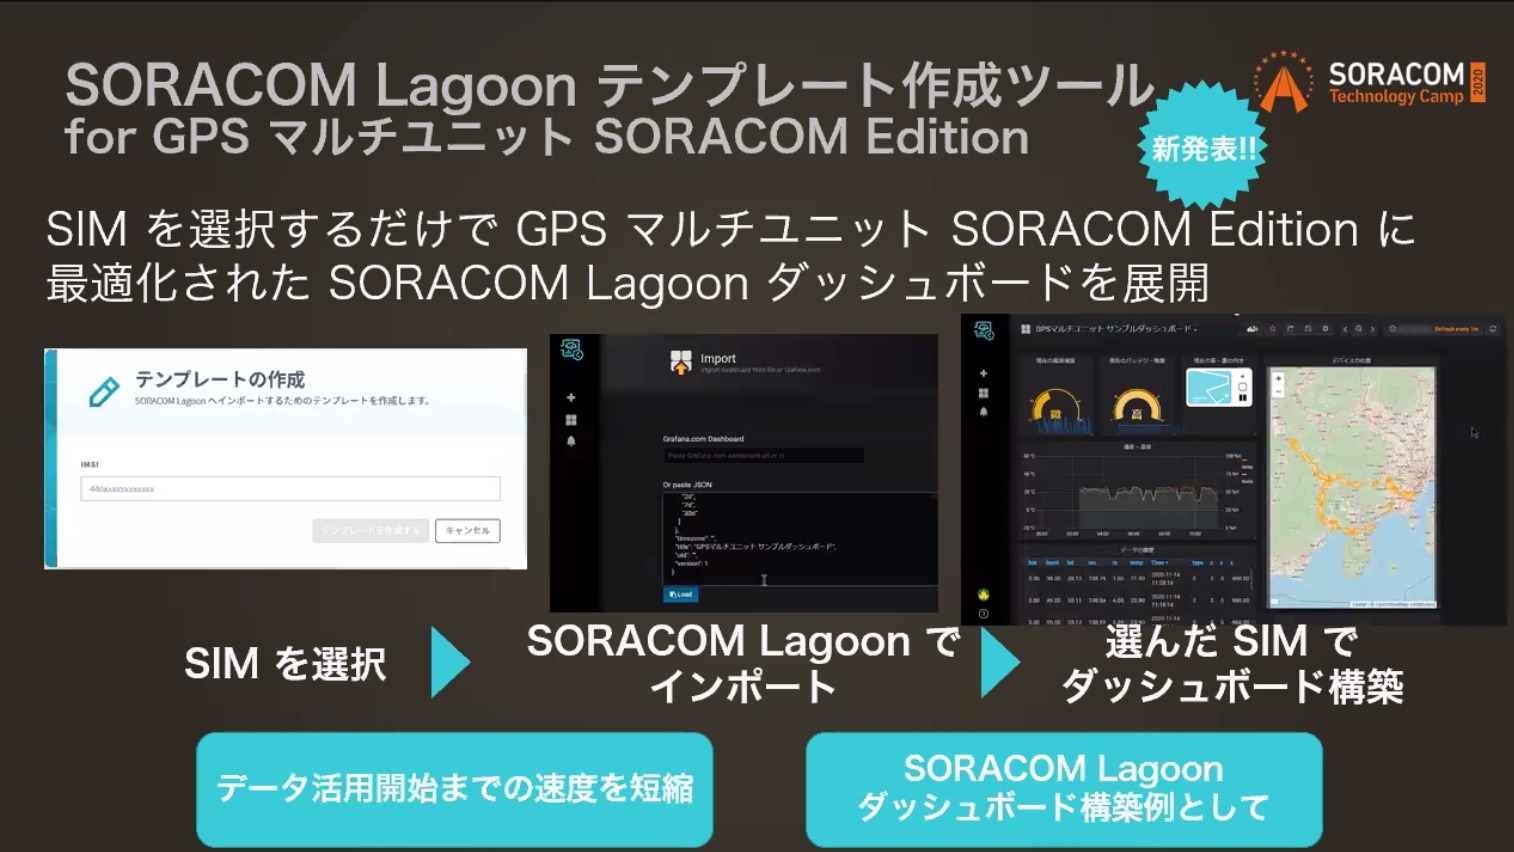 soracom-tech-camp-day1-visualization-14